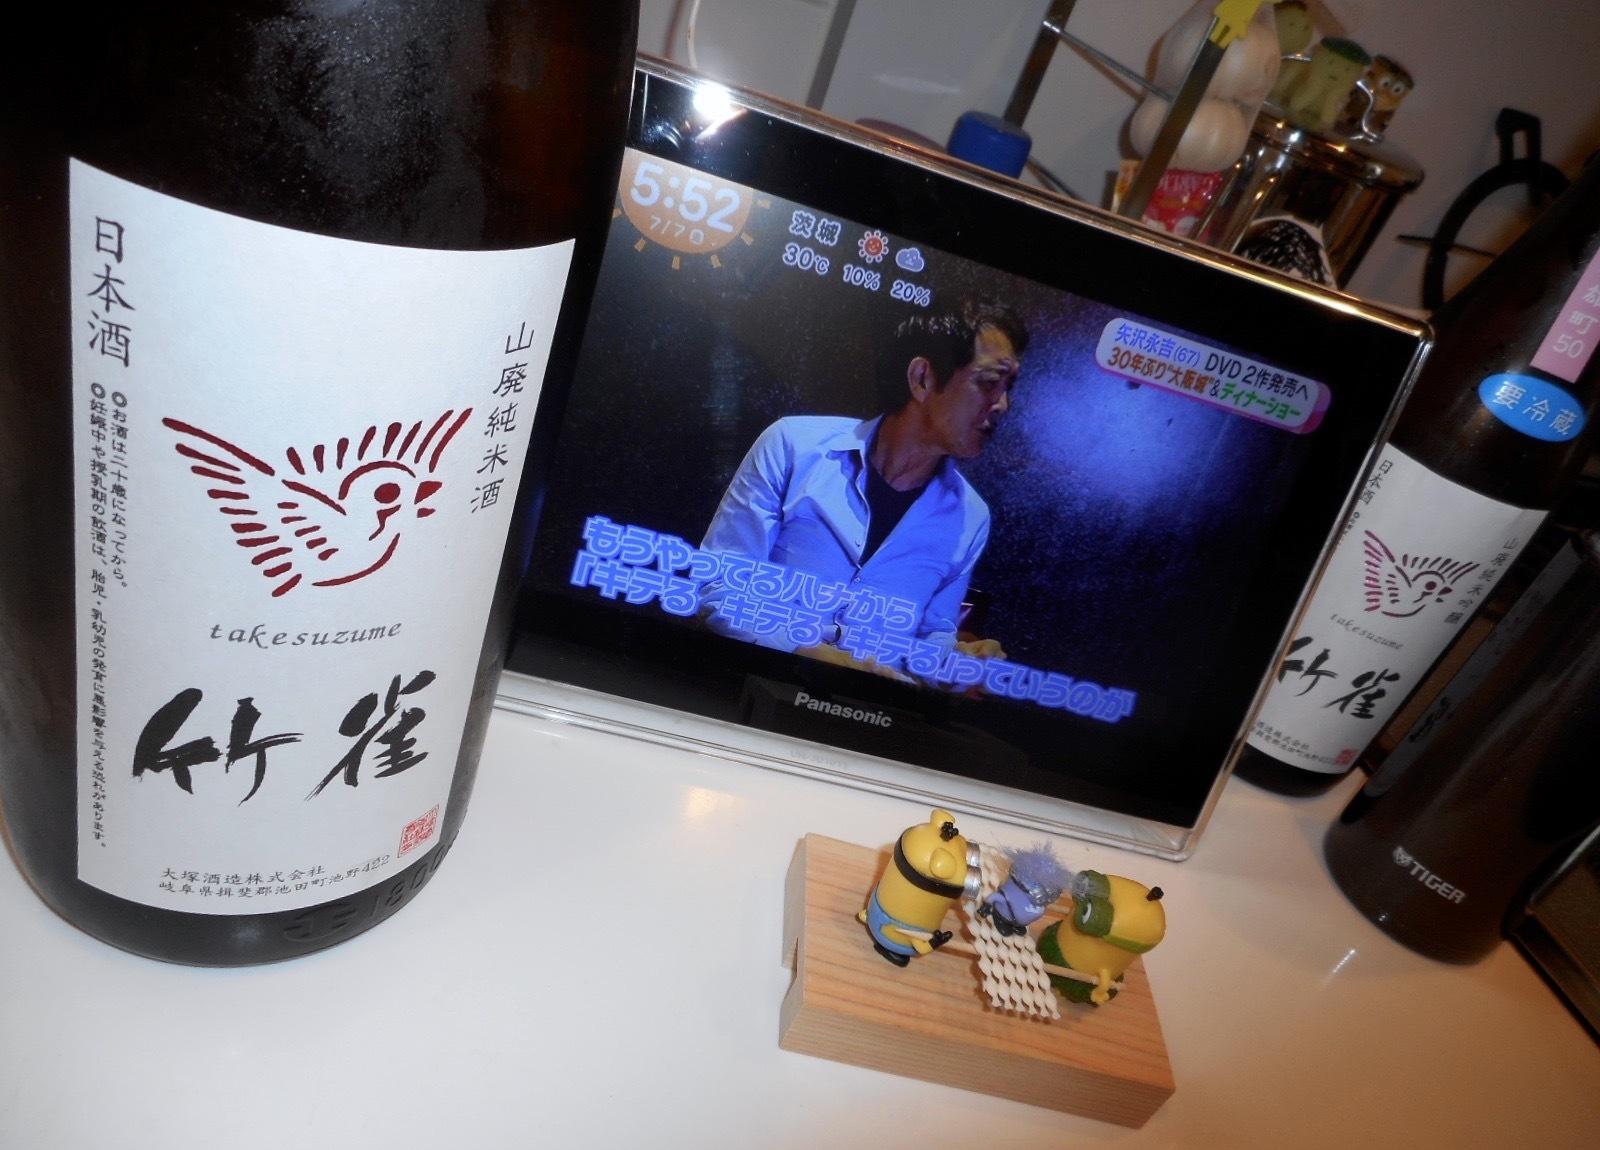 takesuzume_yamahai_junmai28by11.jpg